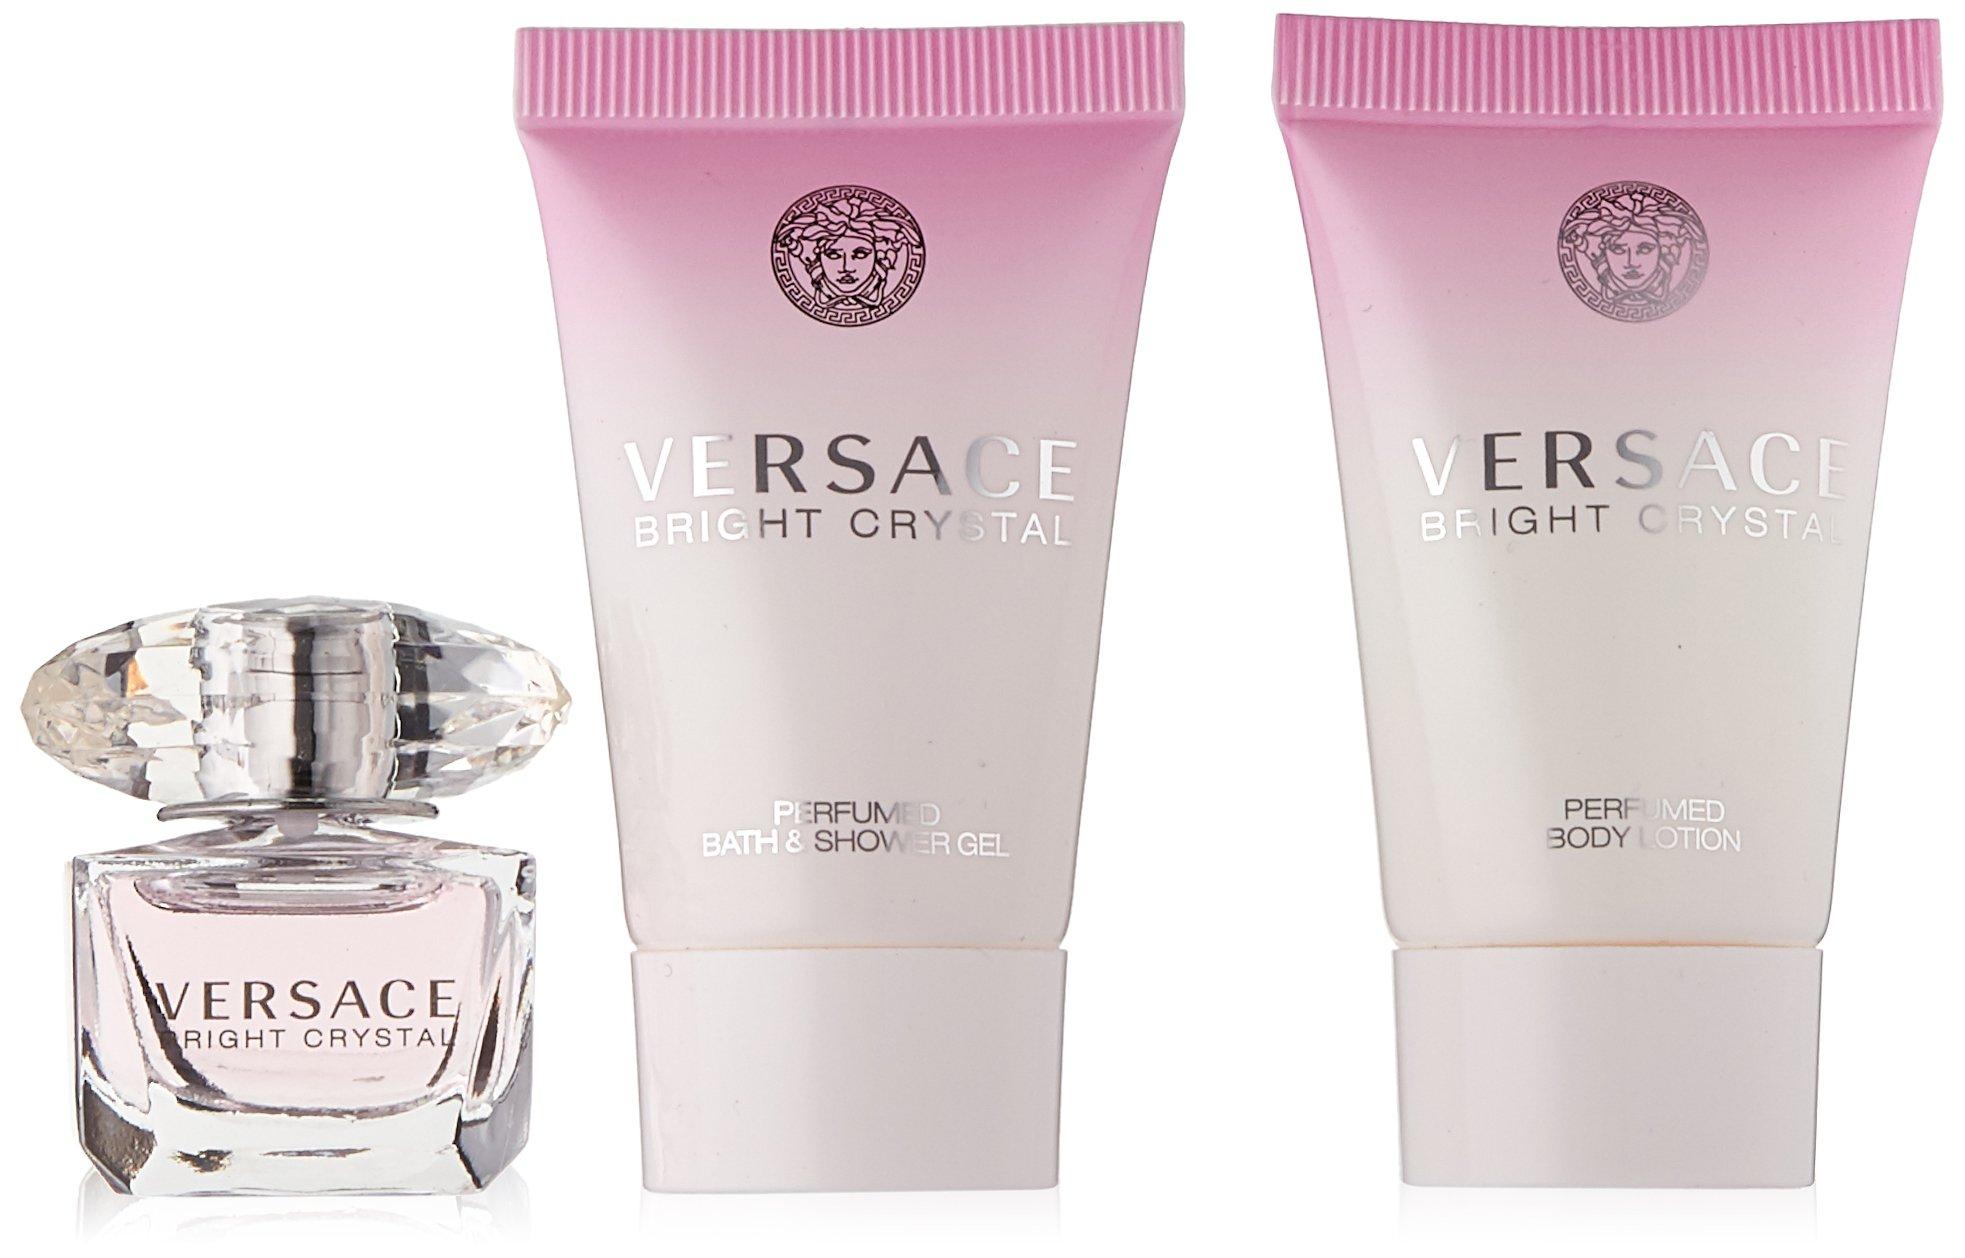 Versace Bright Crystal 3 Piece Miniature Set by Versace